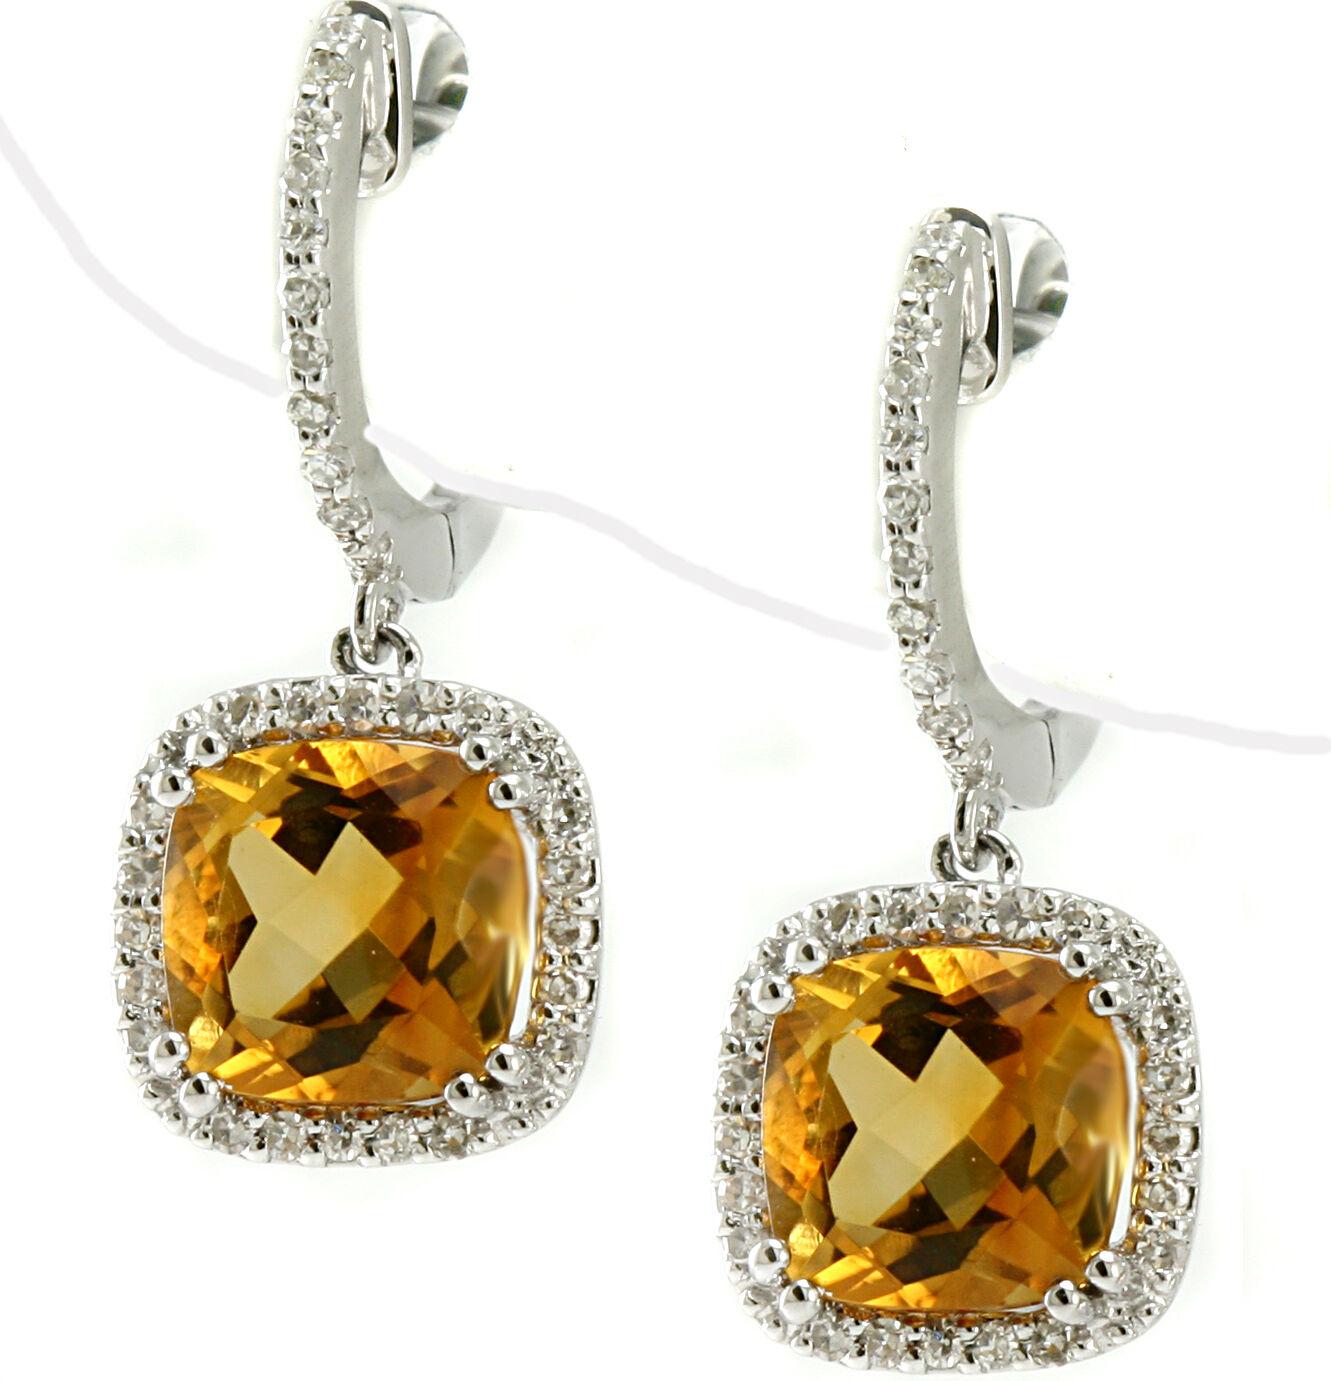 CUSHION-CUT YELLOW CITRINE & DIAMOND HALO DANGLE DROP EARRINGS 14K WHITE gold